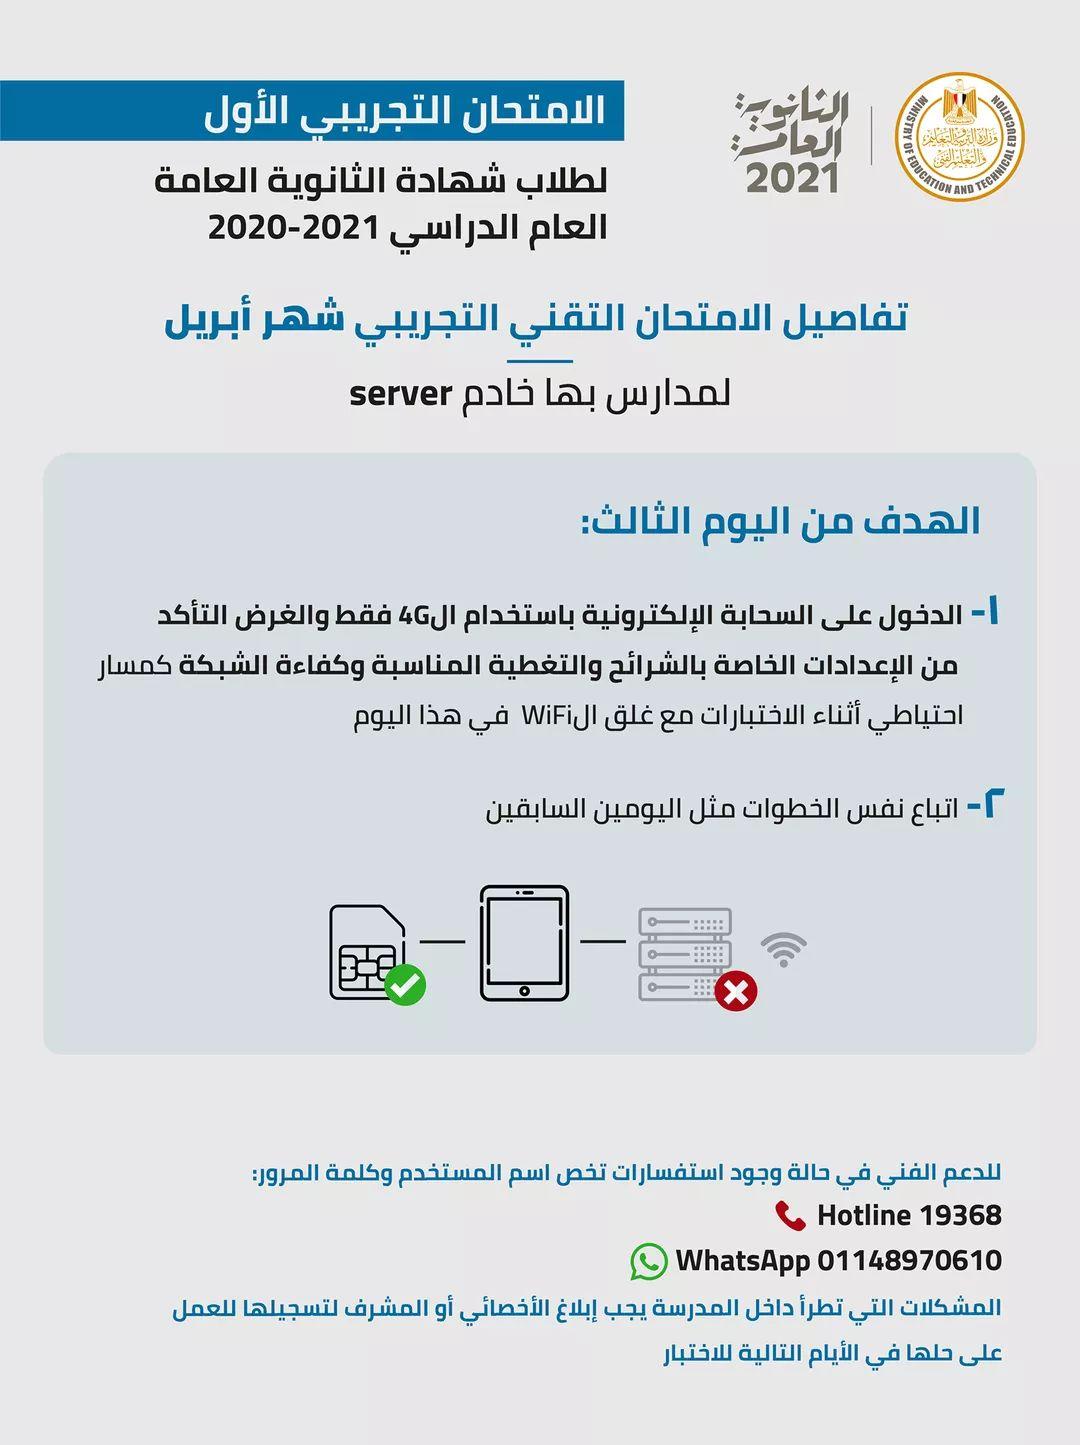 WhatsApp Image 2021-04-15 at 2.06.36 PM (1)